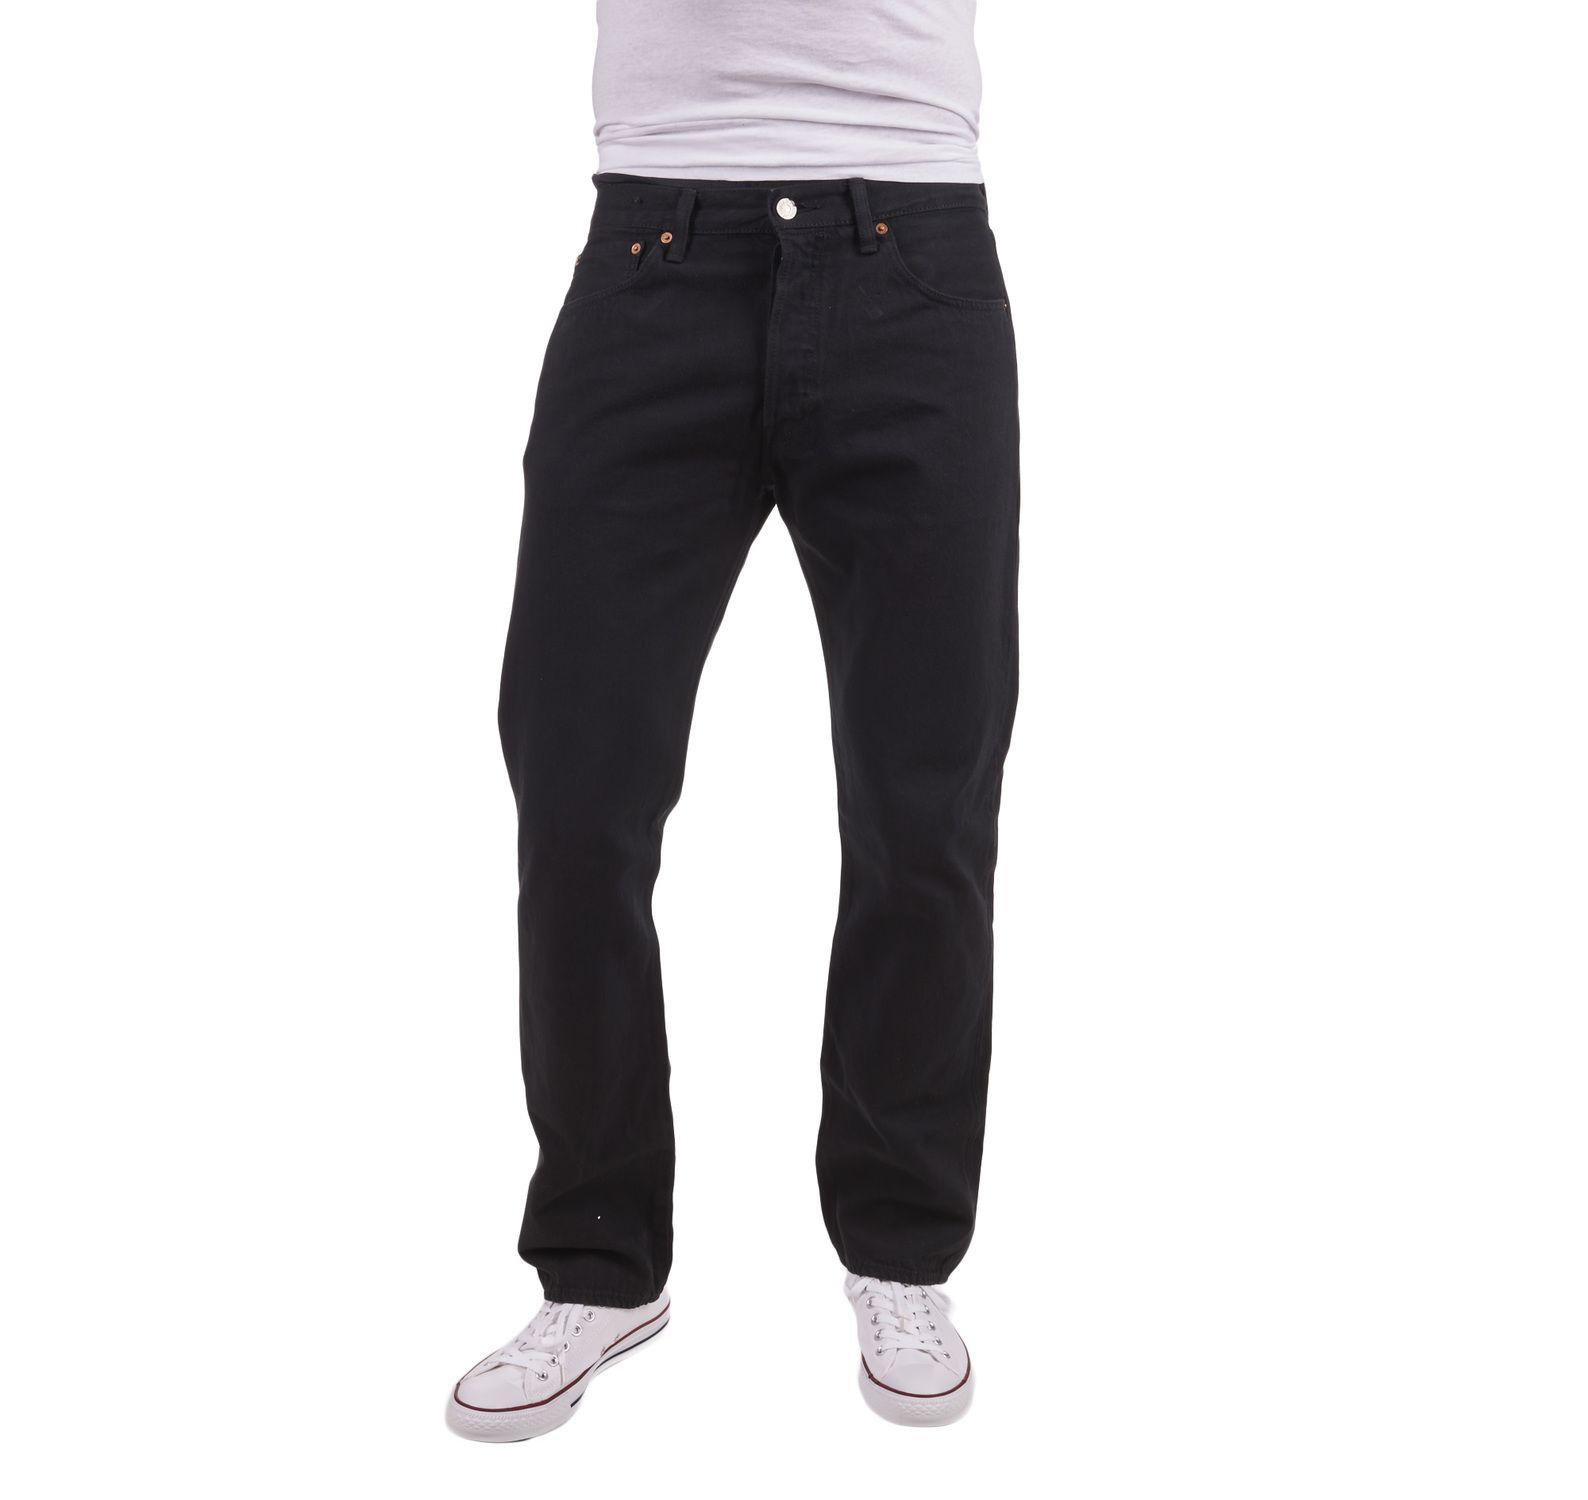 501 levisoriginal fit black 80, blacks, 40/34,  levi's jeans